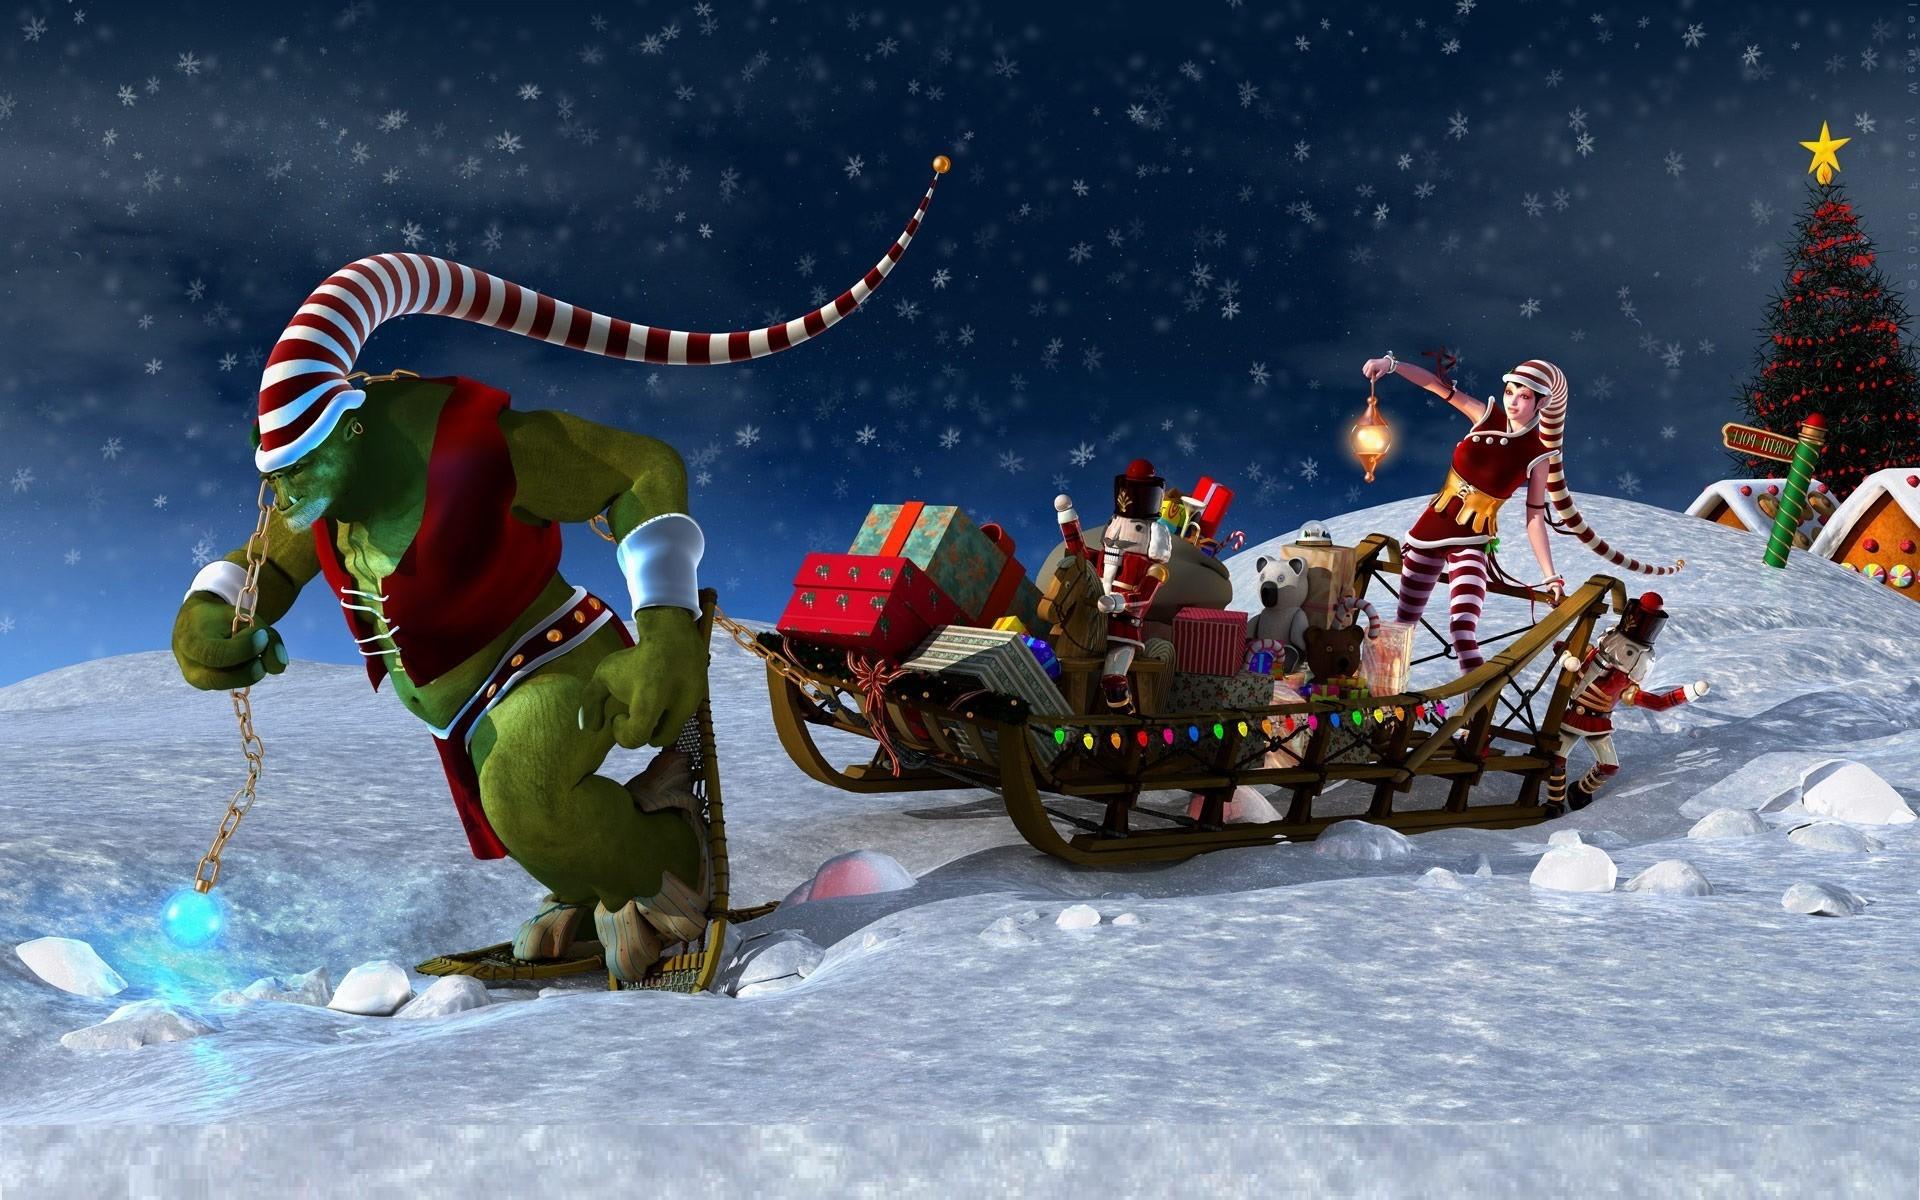 Animated Christmas Backgrounds For Desktop #17359 Wallpaper .